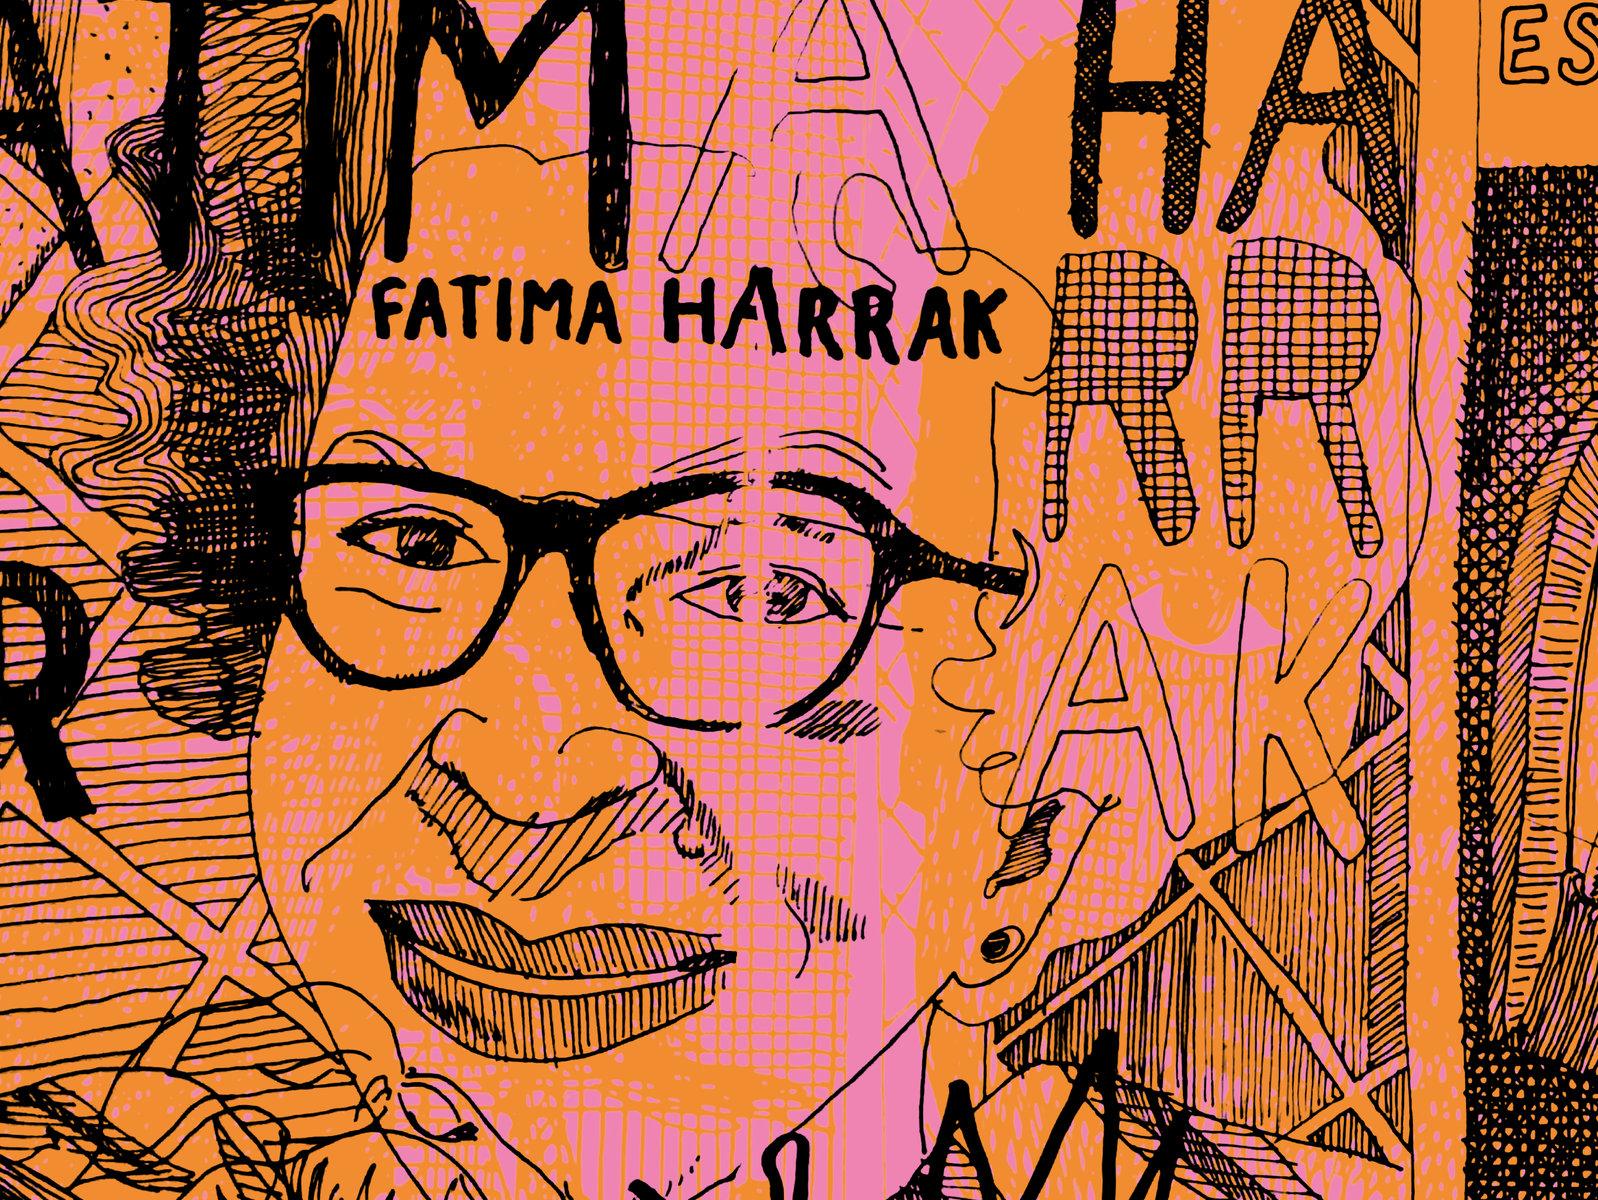 Fatima Harrak: Politics of selective memory